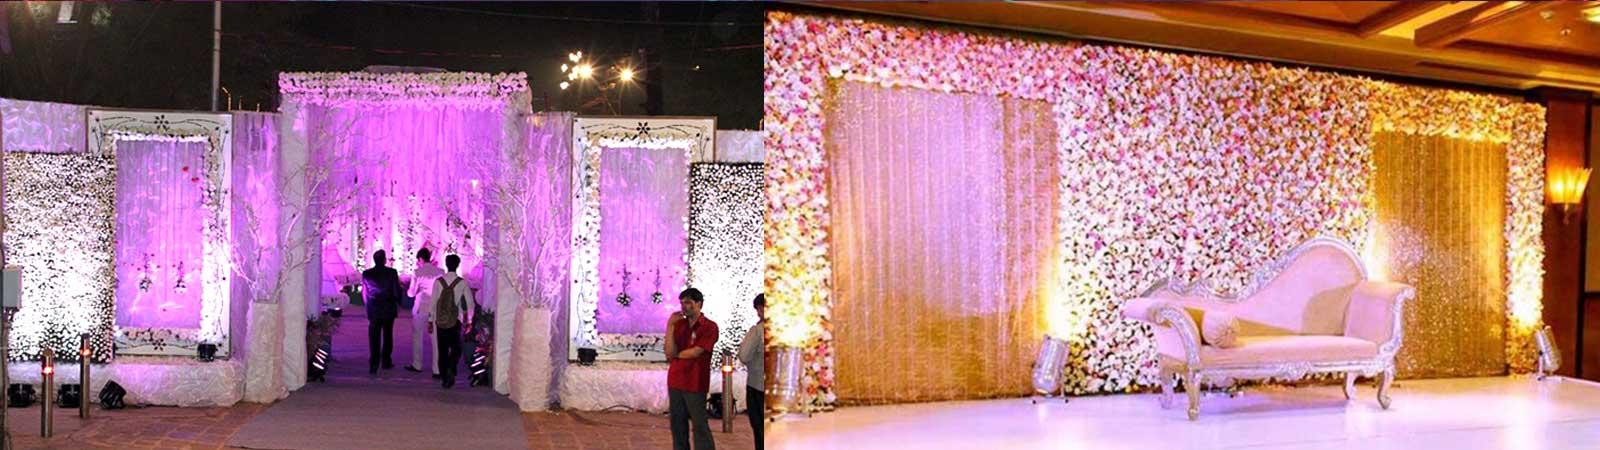 Best wedding decorators in delhi noida gurgaon india wedding best wedding decorations in all over india junglespirit Image collections